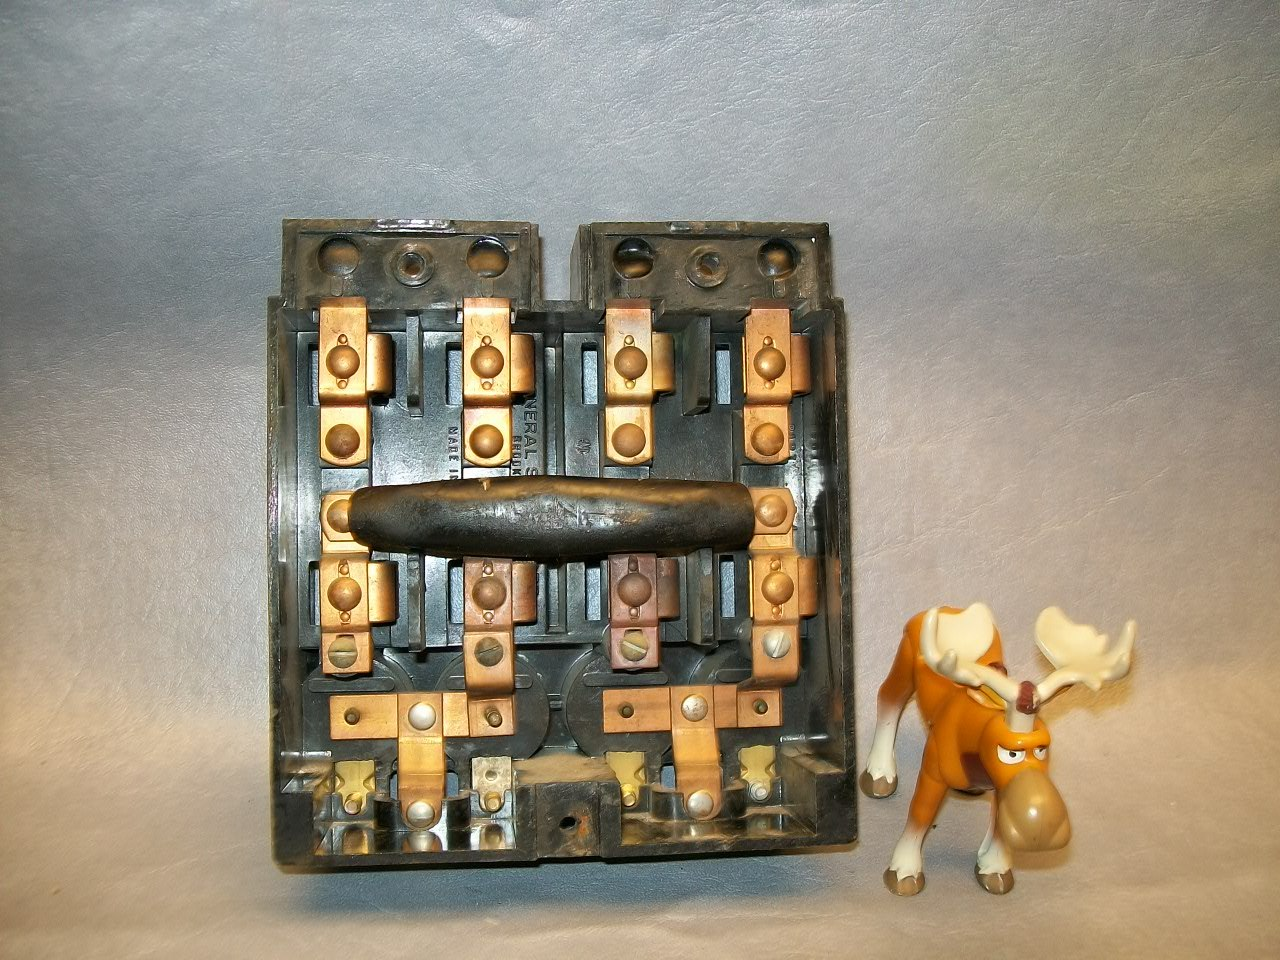 4 slot fuse block